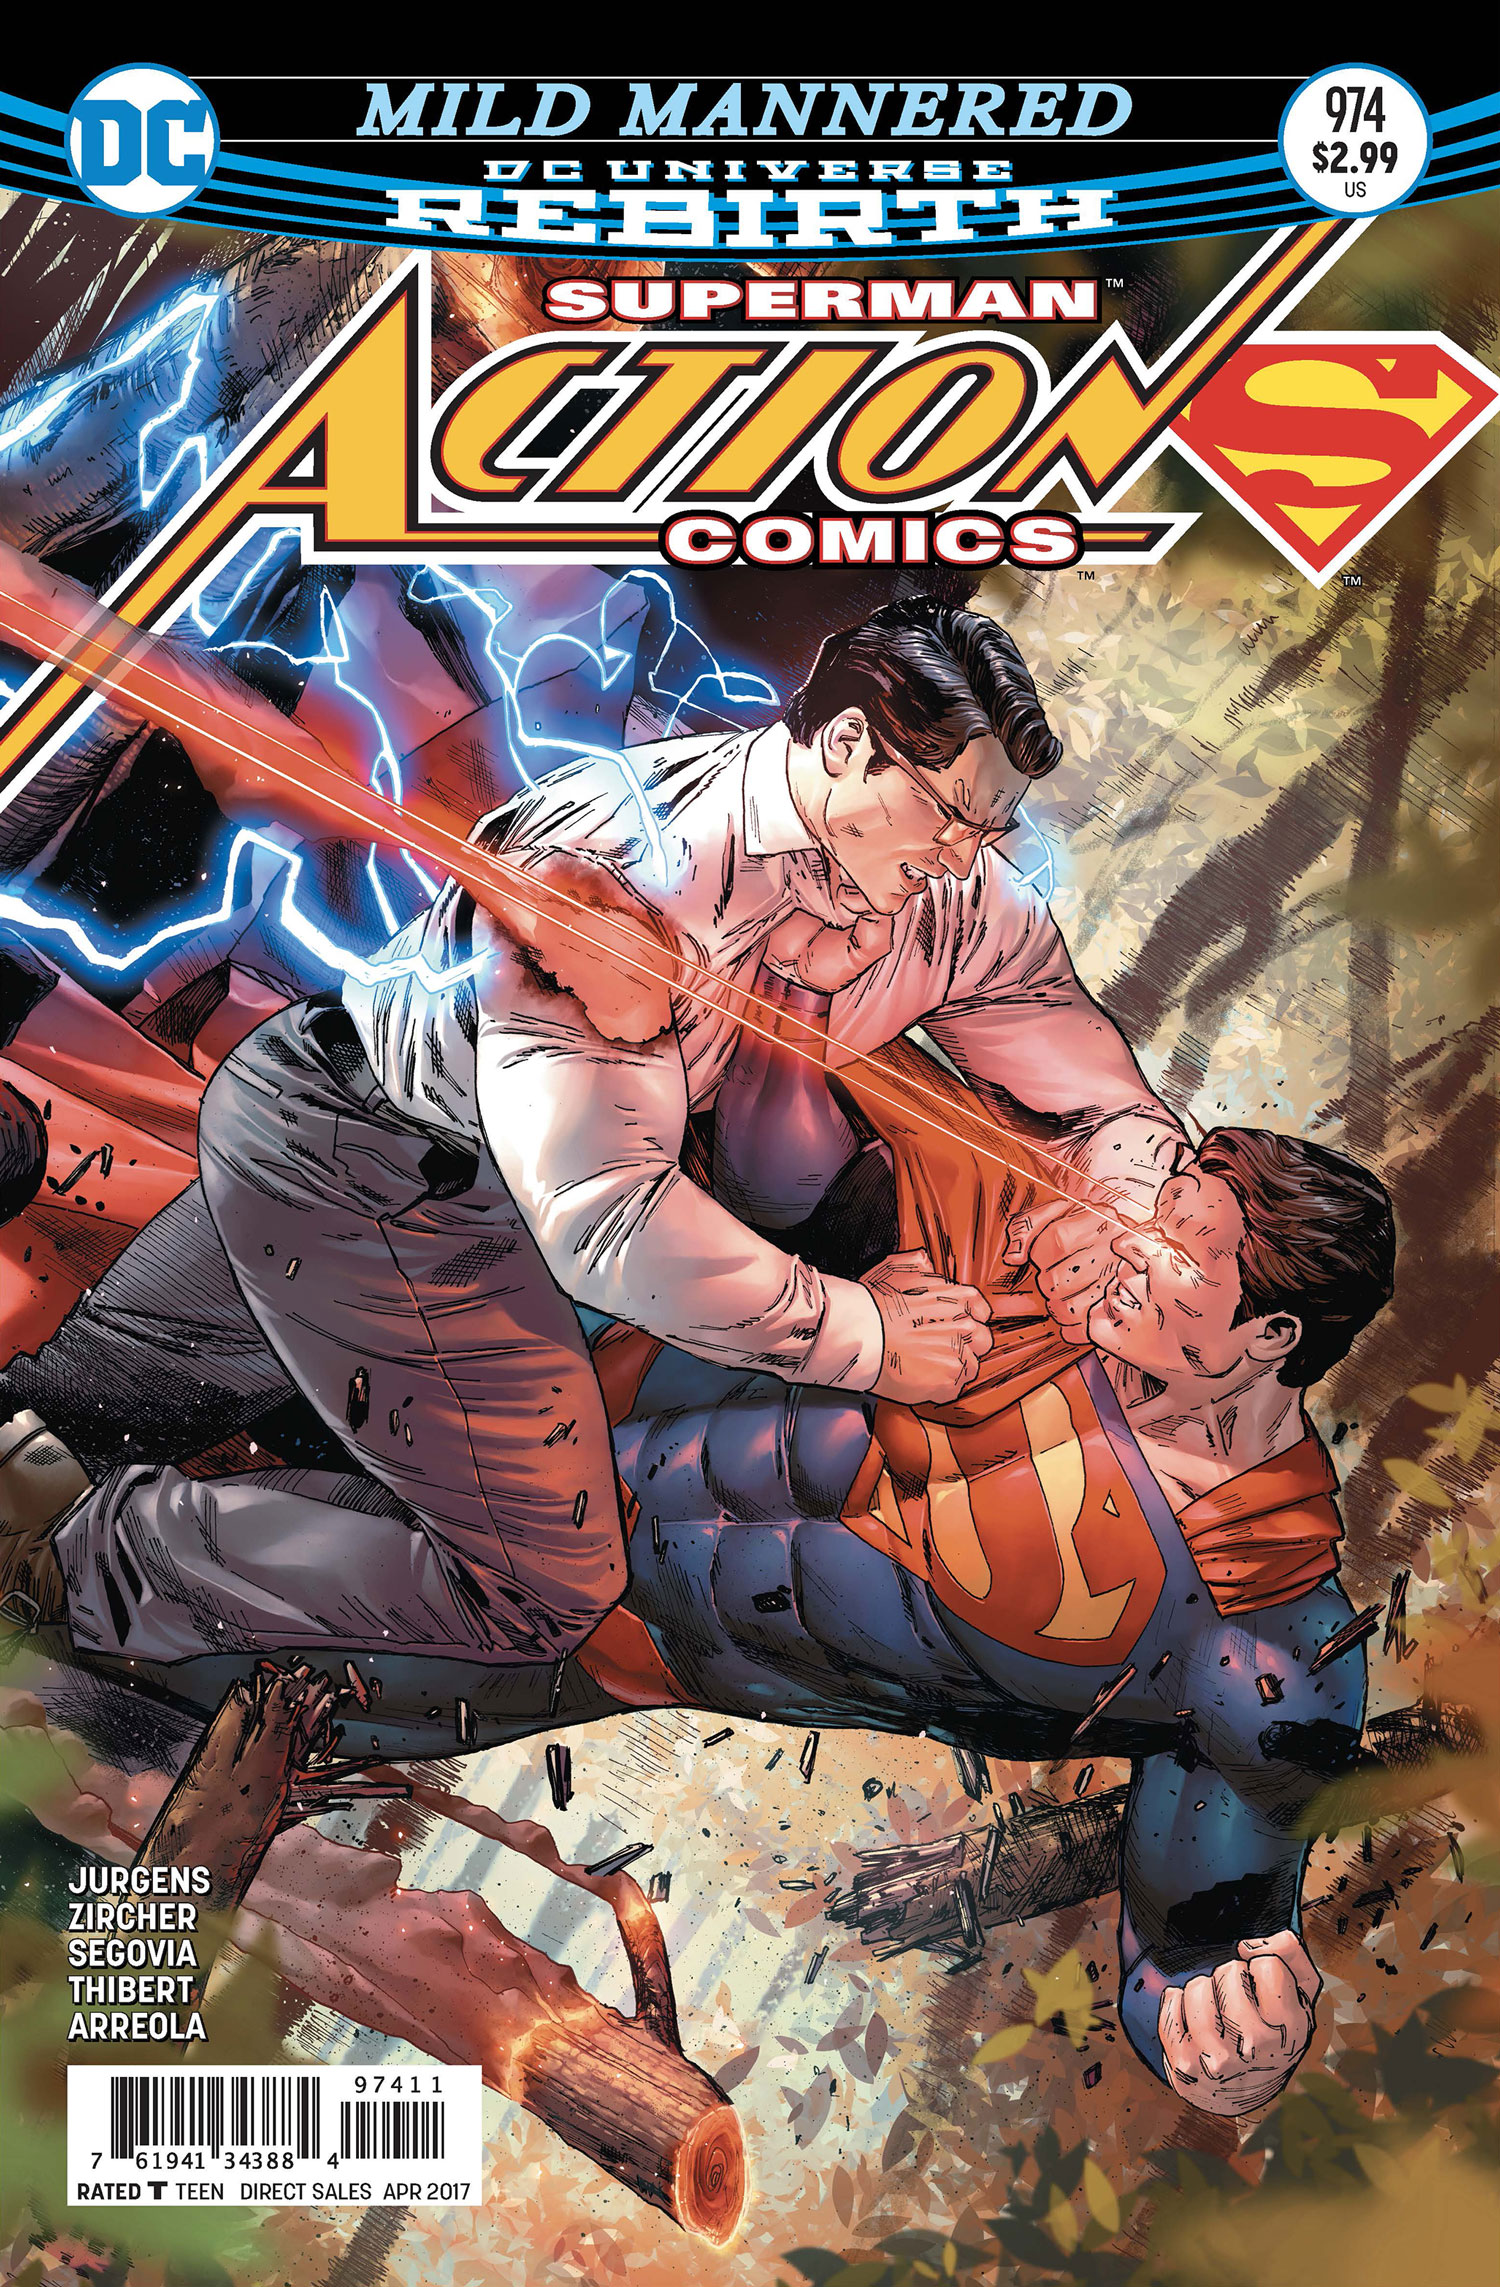 Preview: Action Comics #974